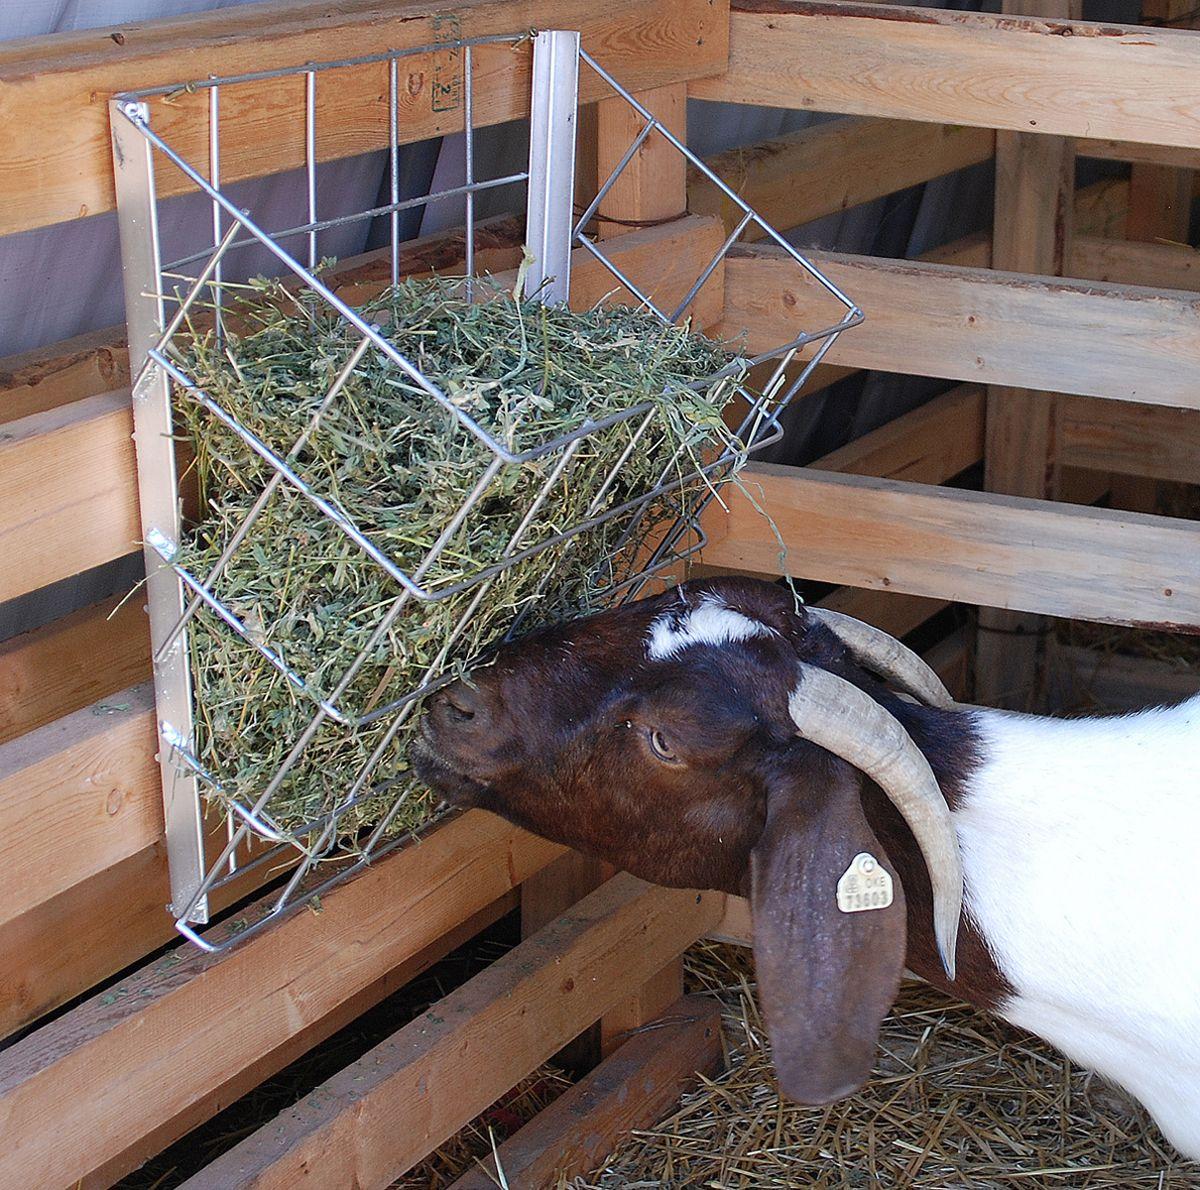 Metal Hay Basket For Goats North Star Hay Grain Feeders Goat Sheep Equipment Goat Sheep Goat Feeder Goat Hay Feeder Pygmy Goat